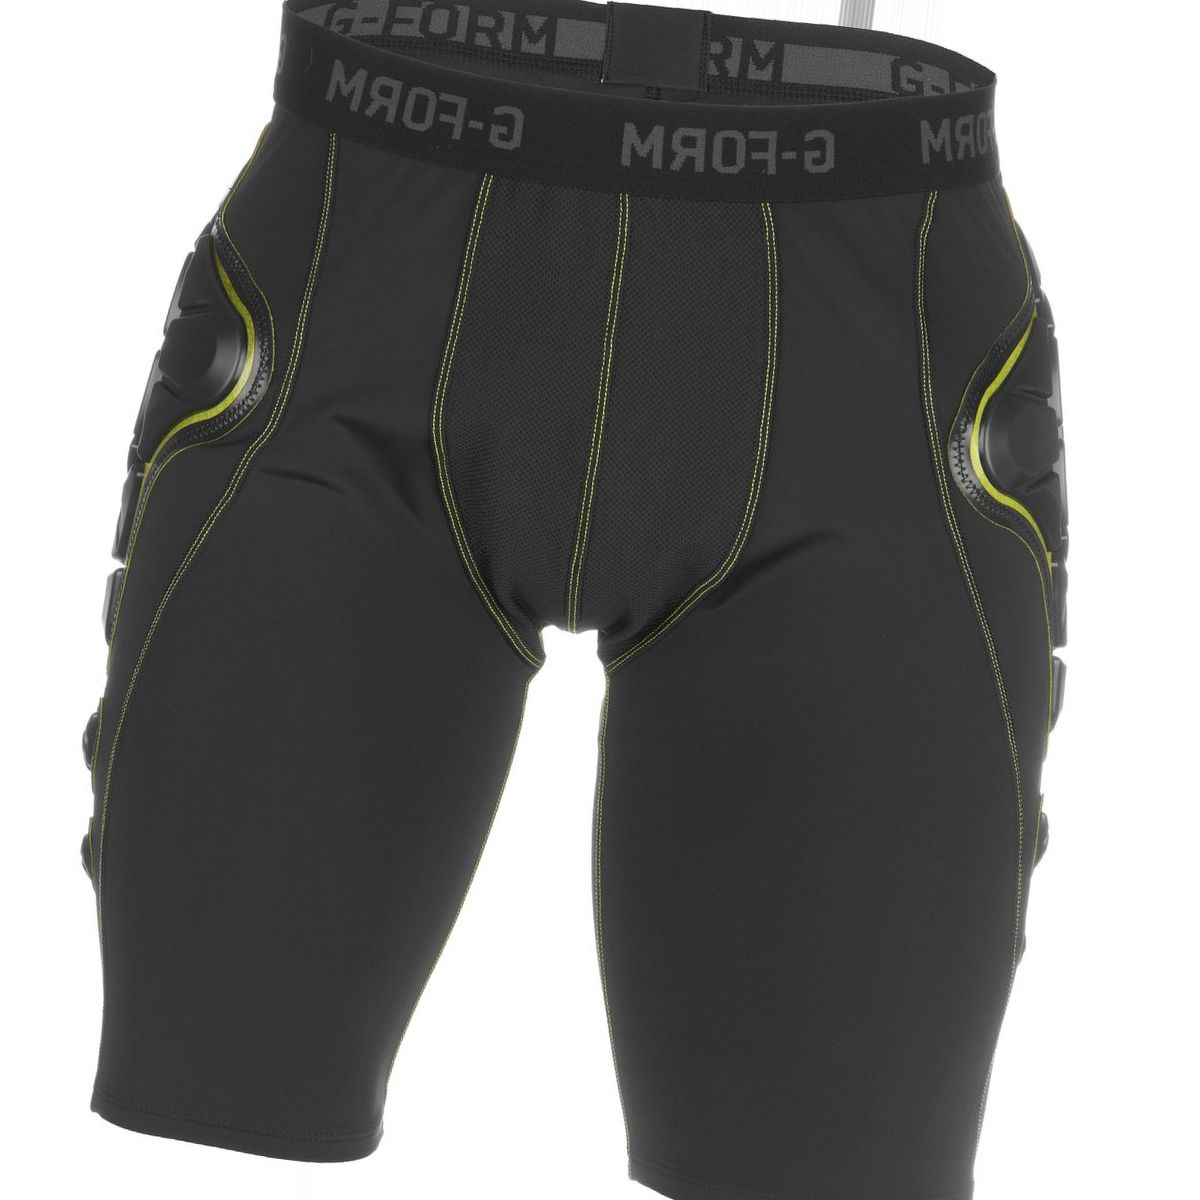 G-Form Pro-X Compression Shorts - Men's